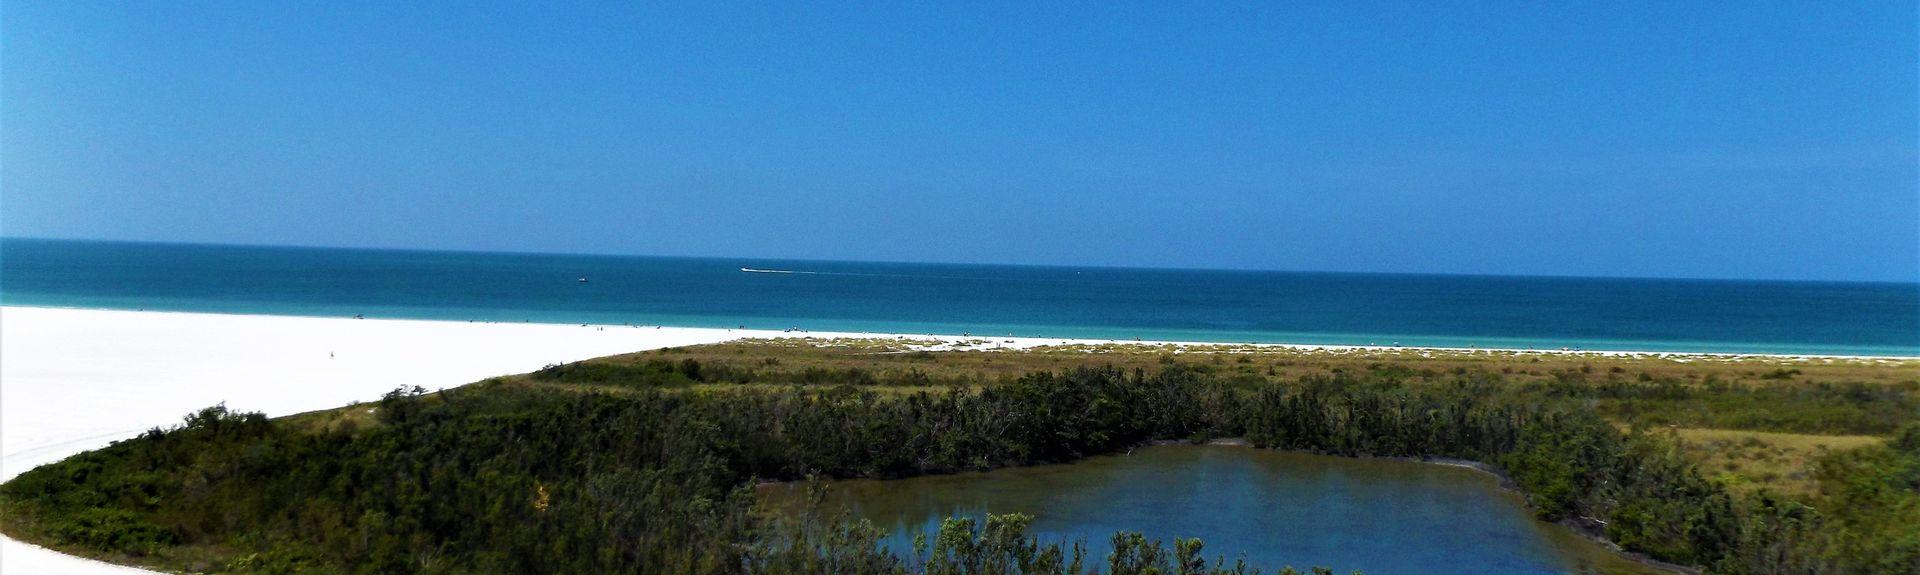 Marco Island Marina, Marco Island, FL, USA